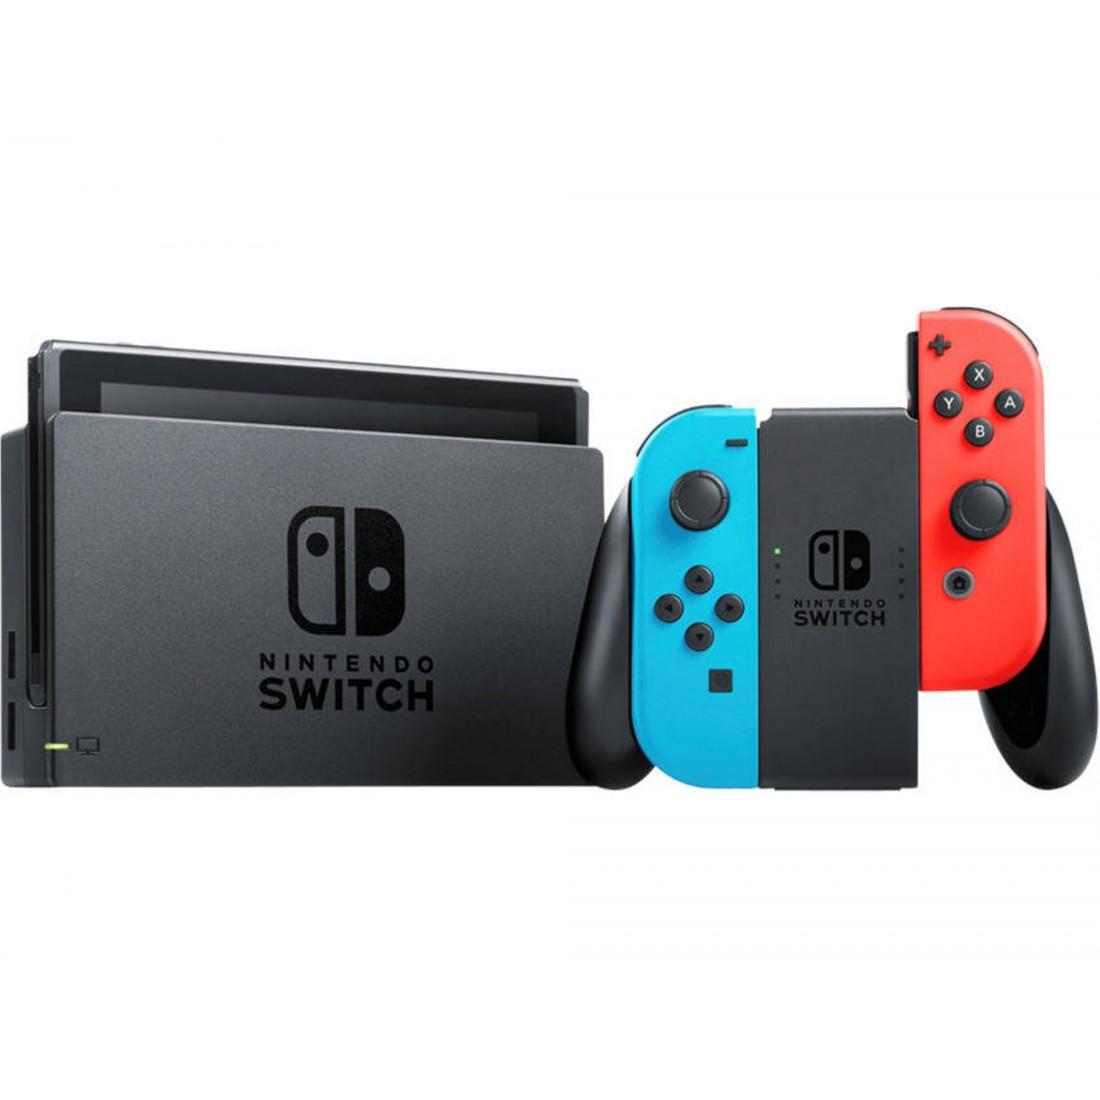 Consola Nintendo Switch V2 (32 GB - Azul y Rojo Neón)